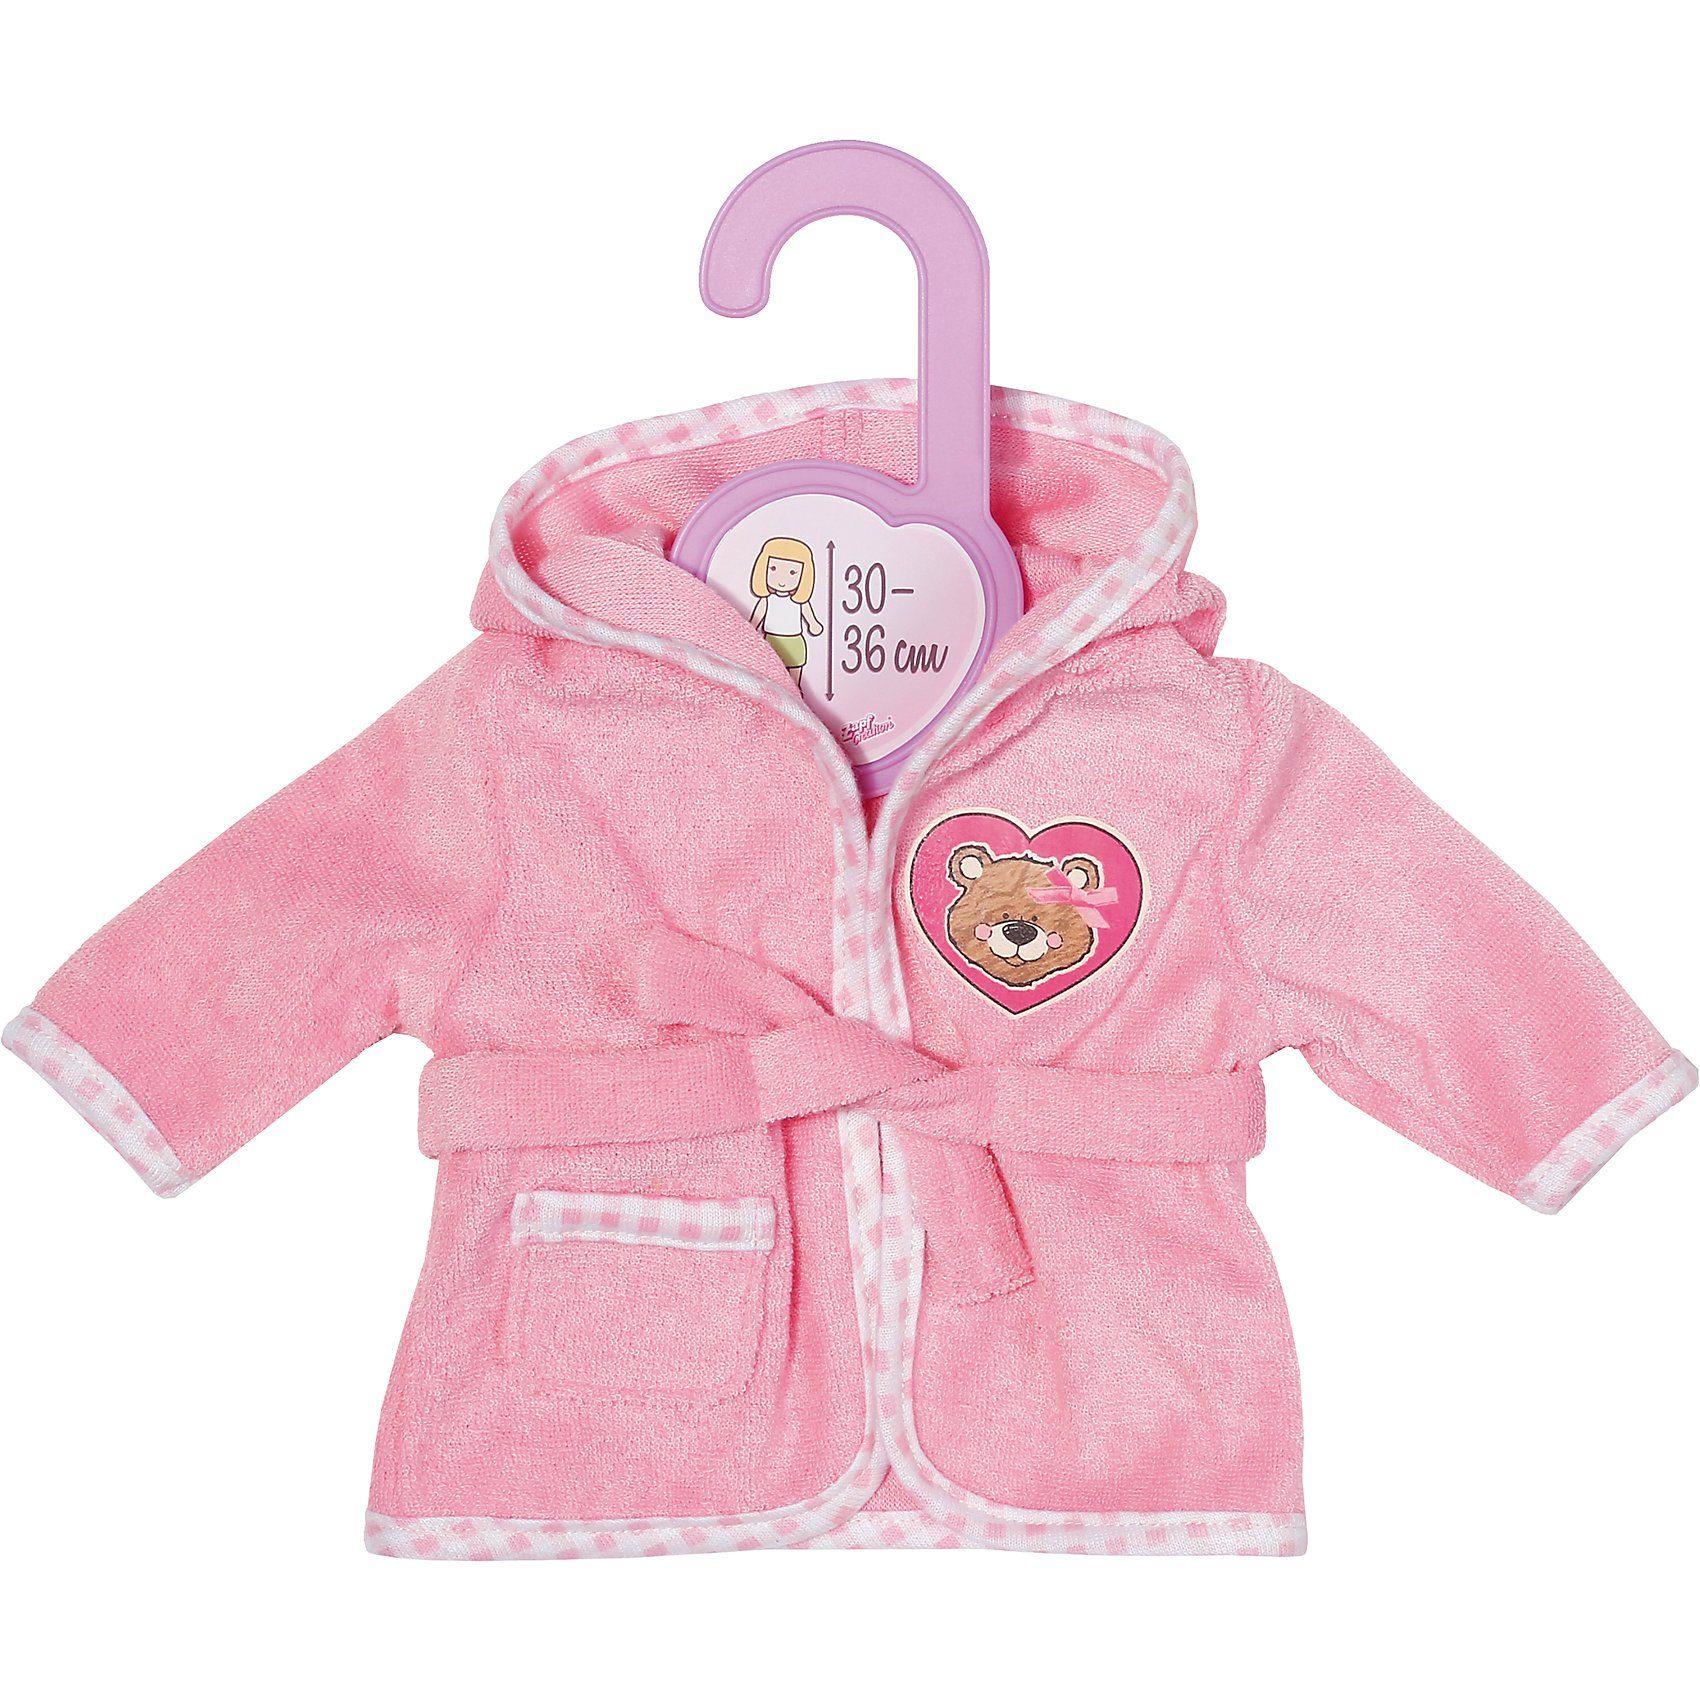 Zapf BABY born® Kleider Kollektion Dolly Moda Jeanskleid ab 1 Größe 30-36cm